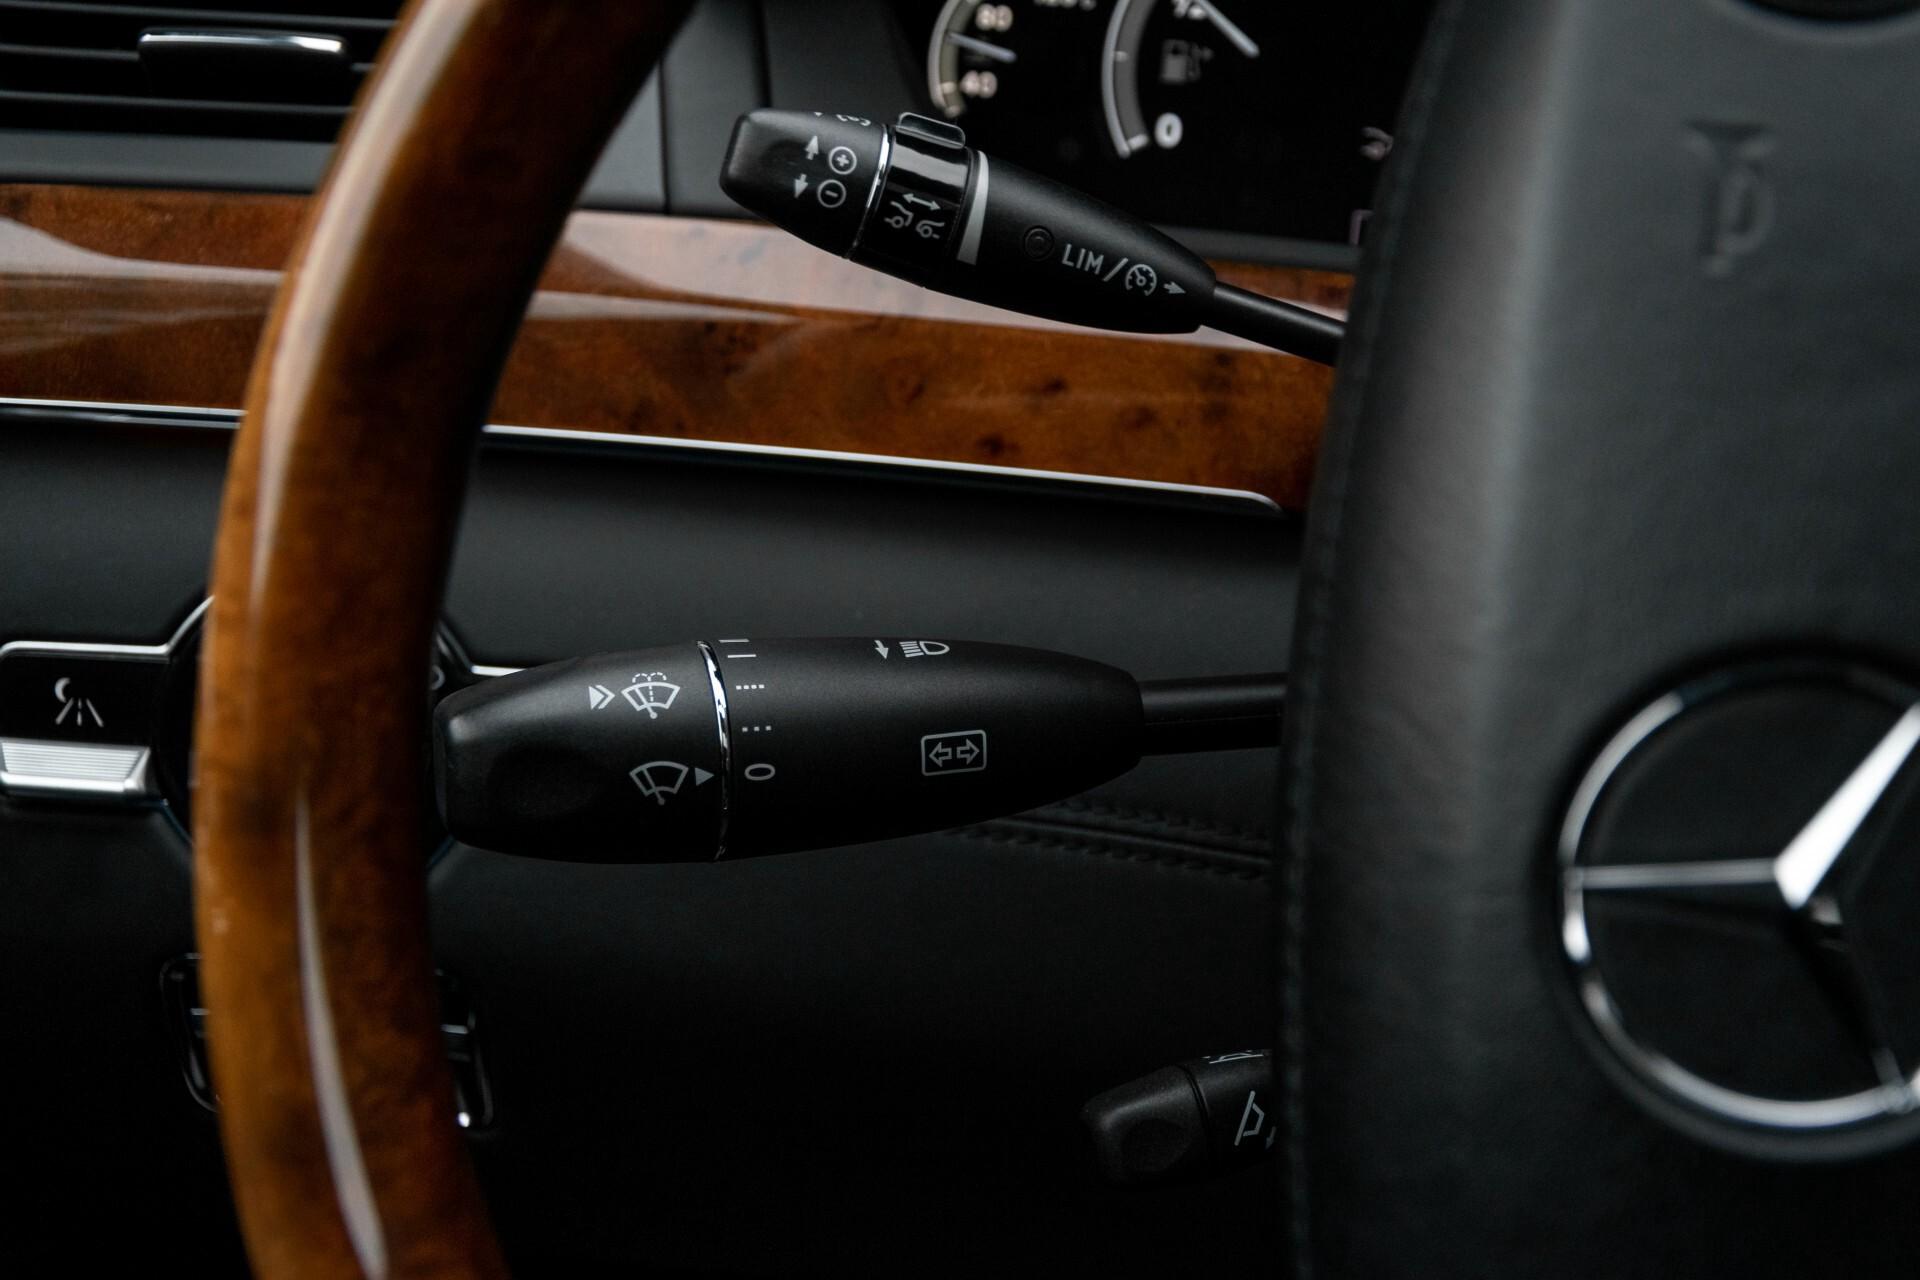 Mercedes-Benz S-Klasse 600 Lang 65 AMG Bi-Turbo Prestige Plus Aut5 Foto 11